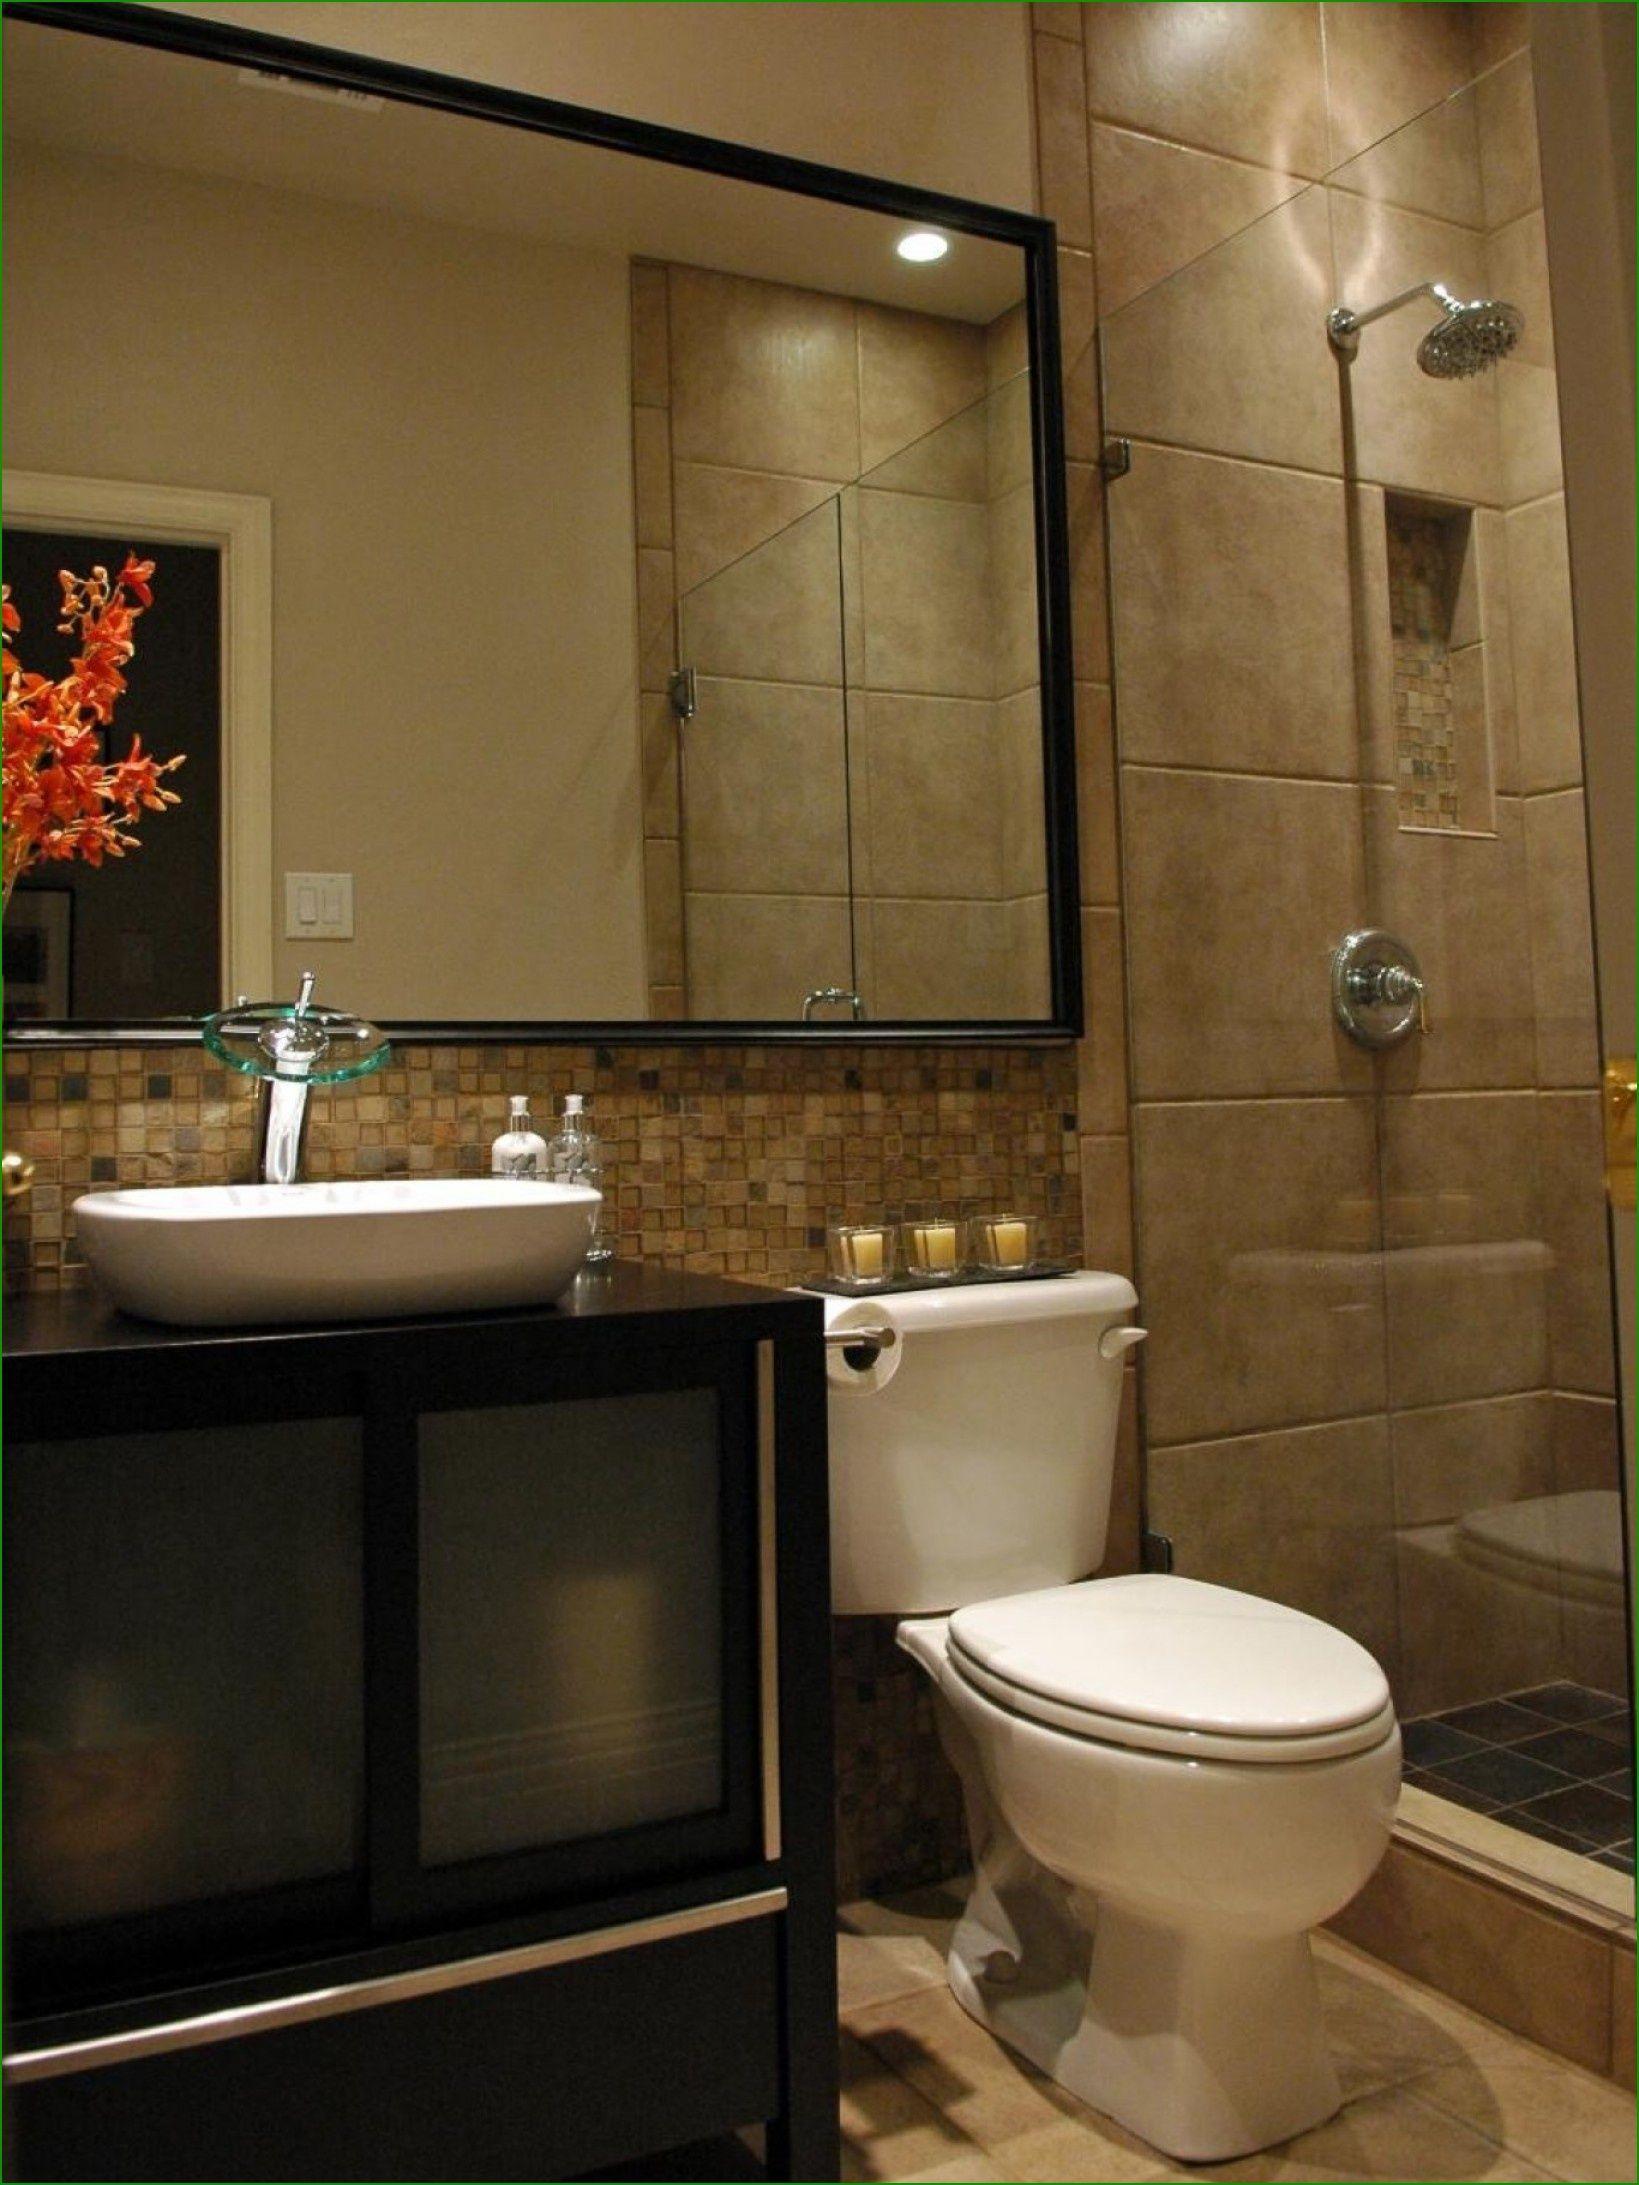 10 surprising narrow bathroom remodel drawers ideas